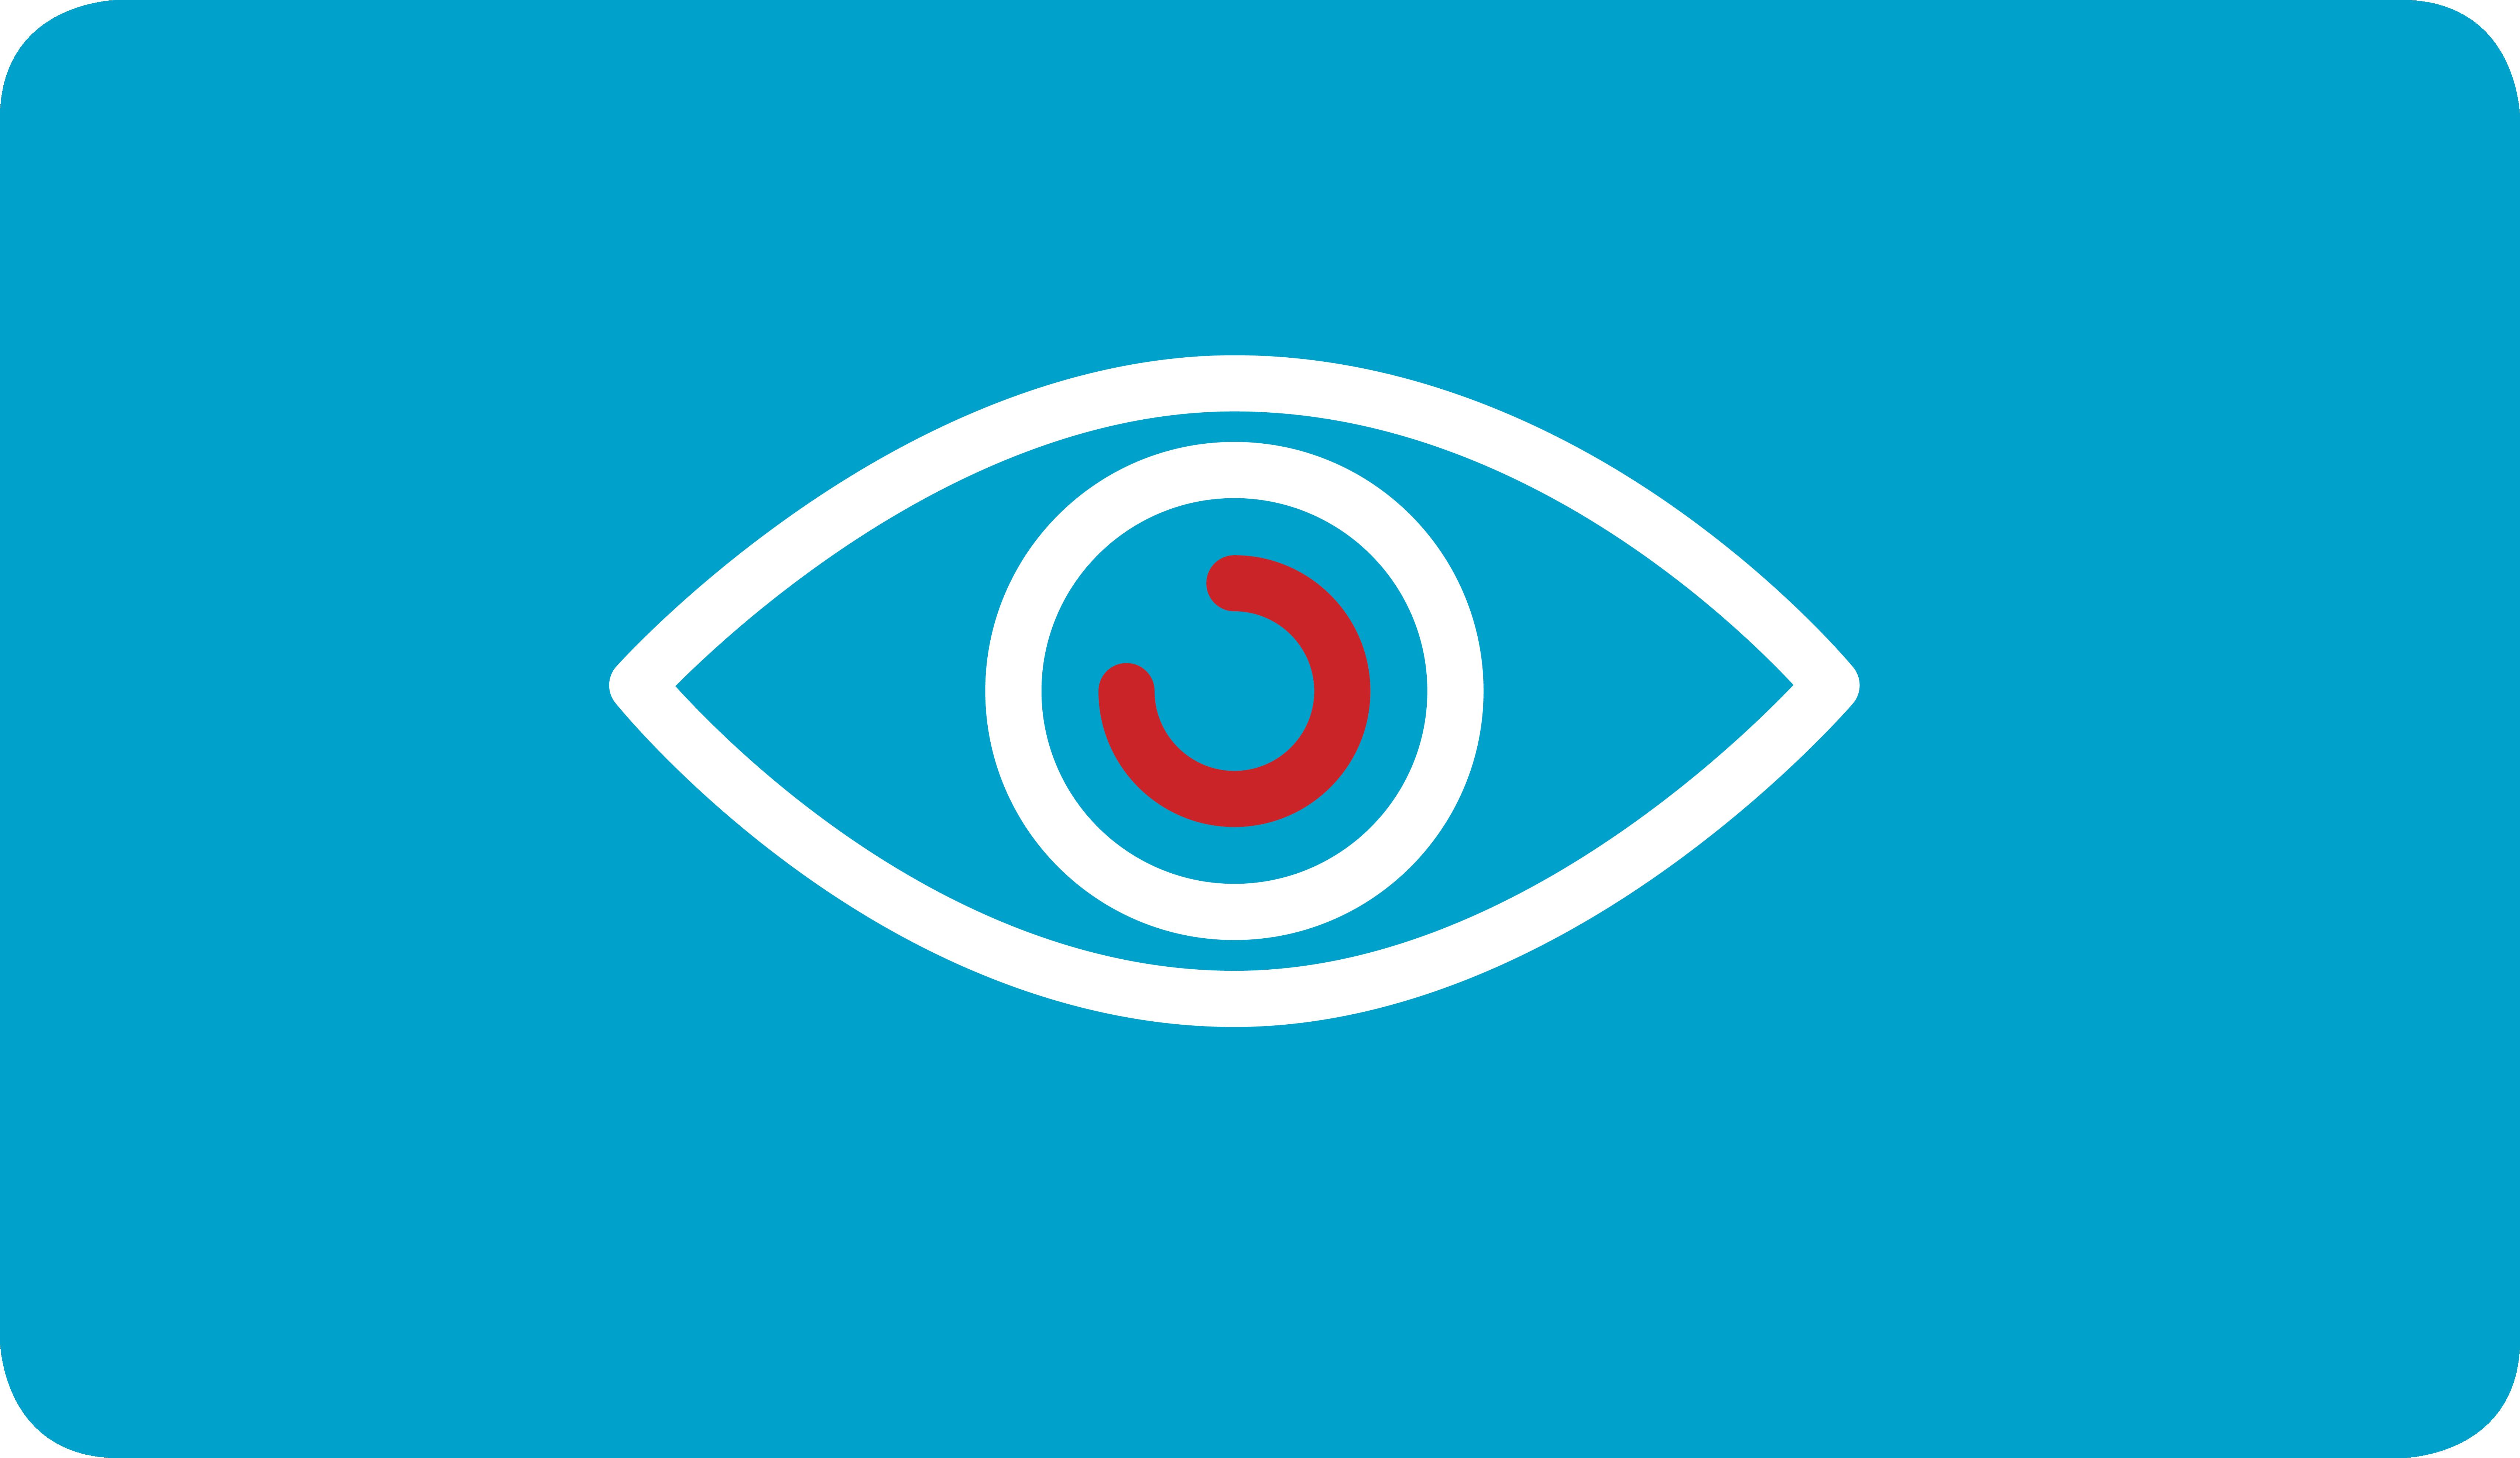 viewingsintoinstructions_big1